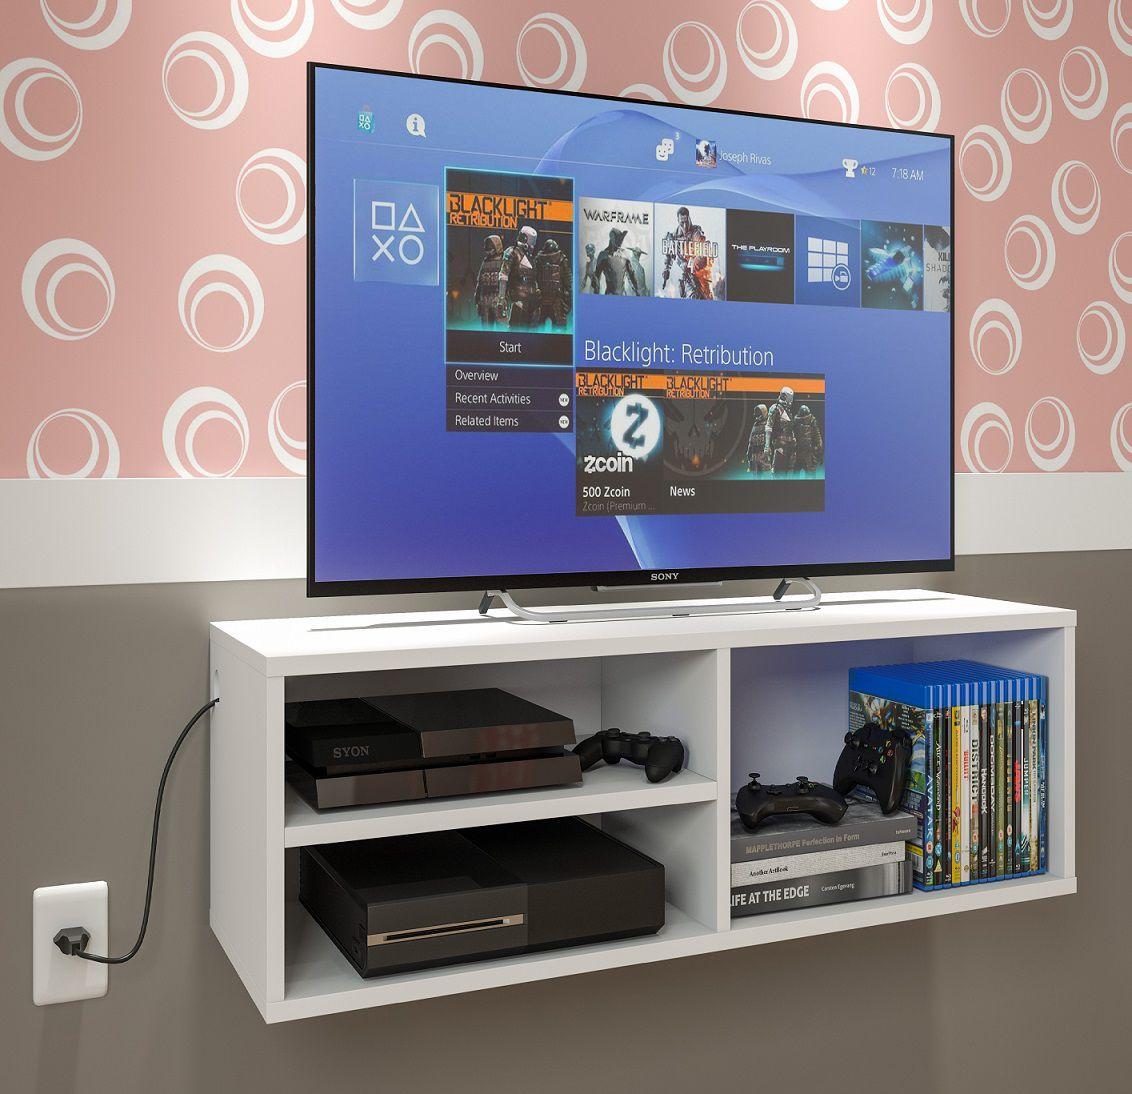 Rack Para Tv, Dvd, Blue Ray, Cd, Game Nicho Cores Mod.